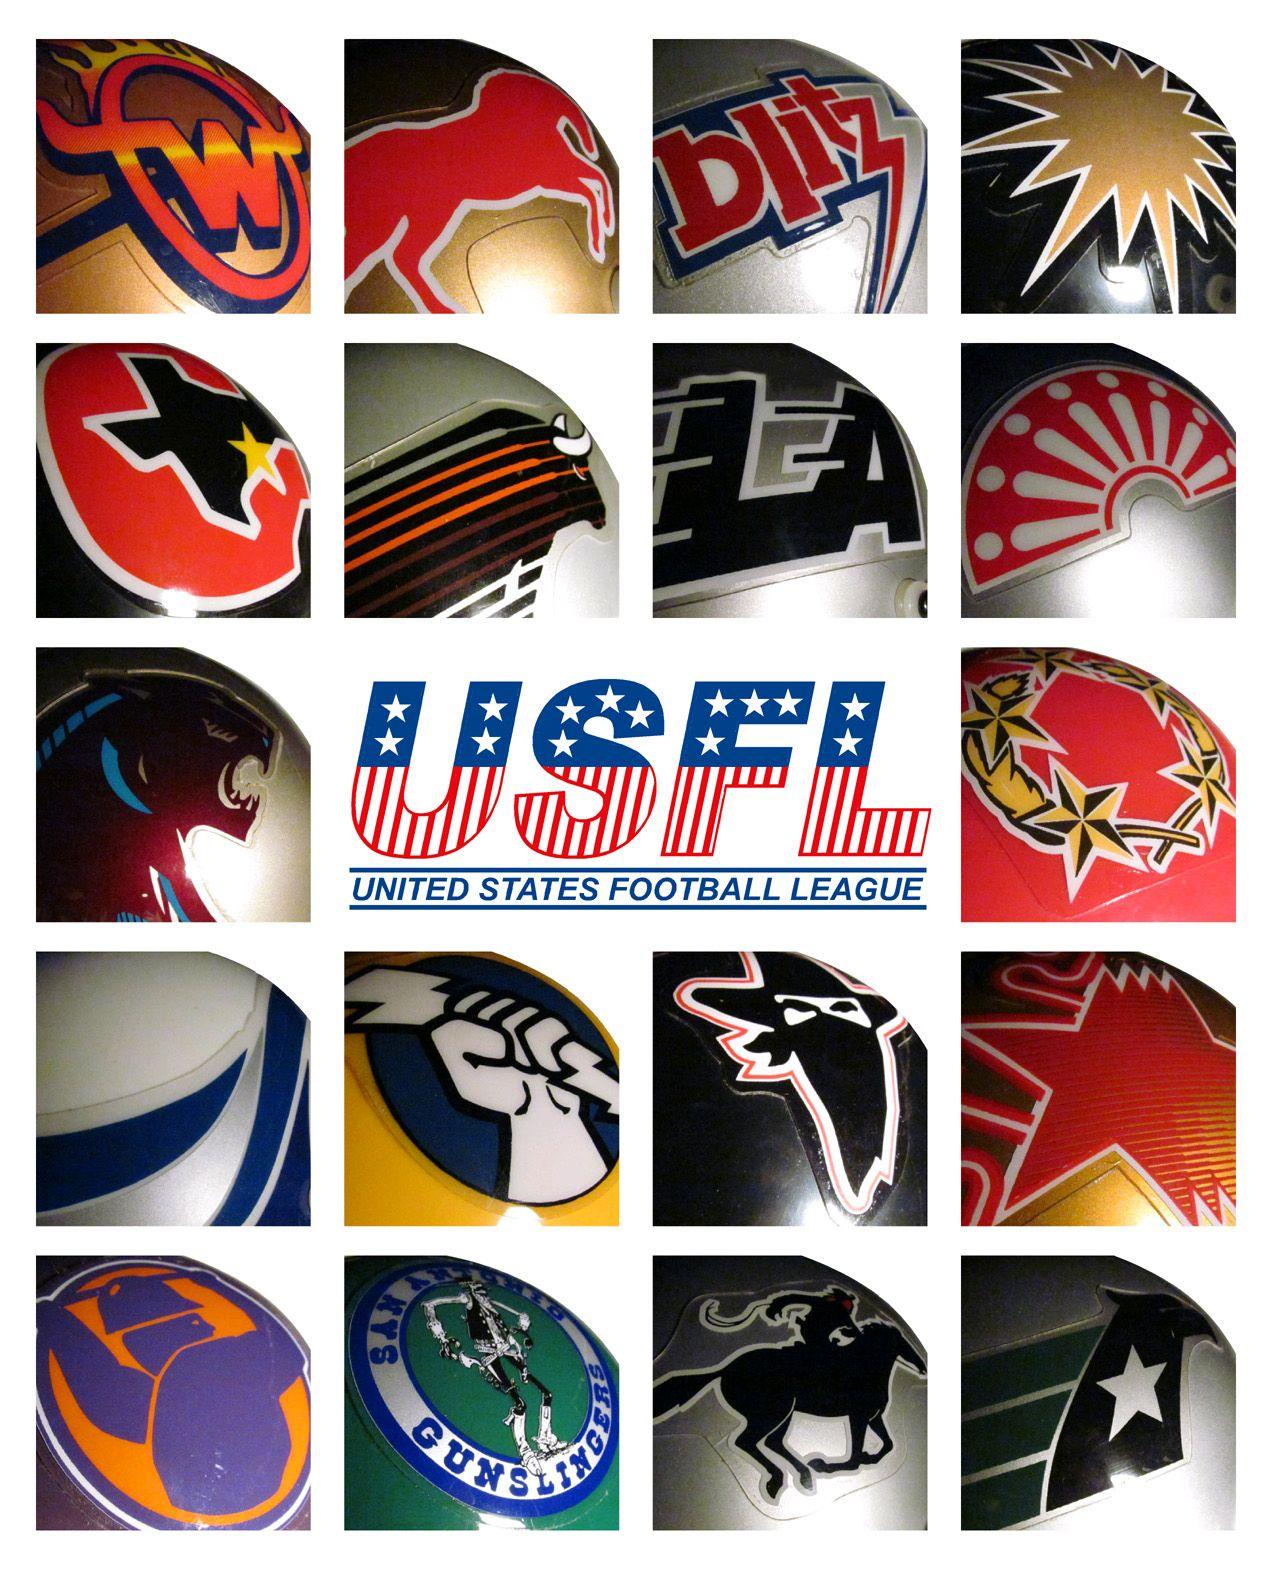 A11 Football League Football League American Football Football